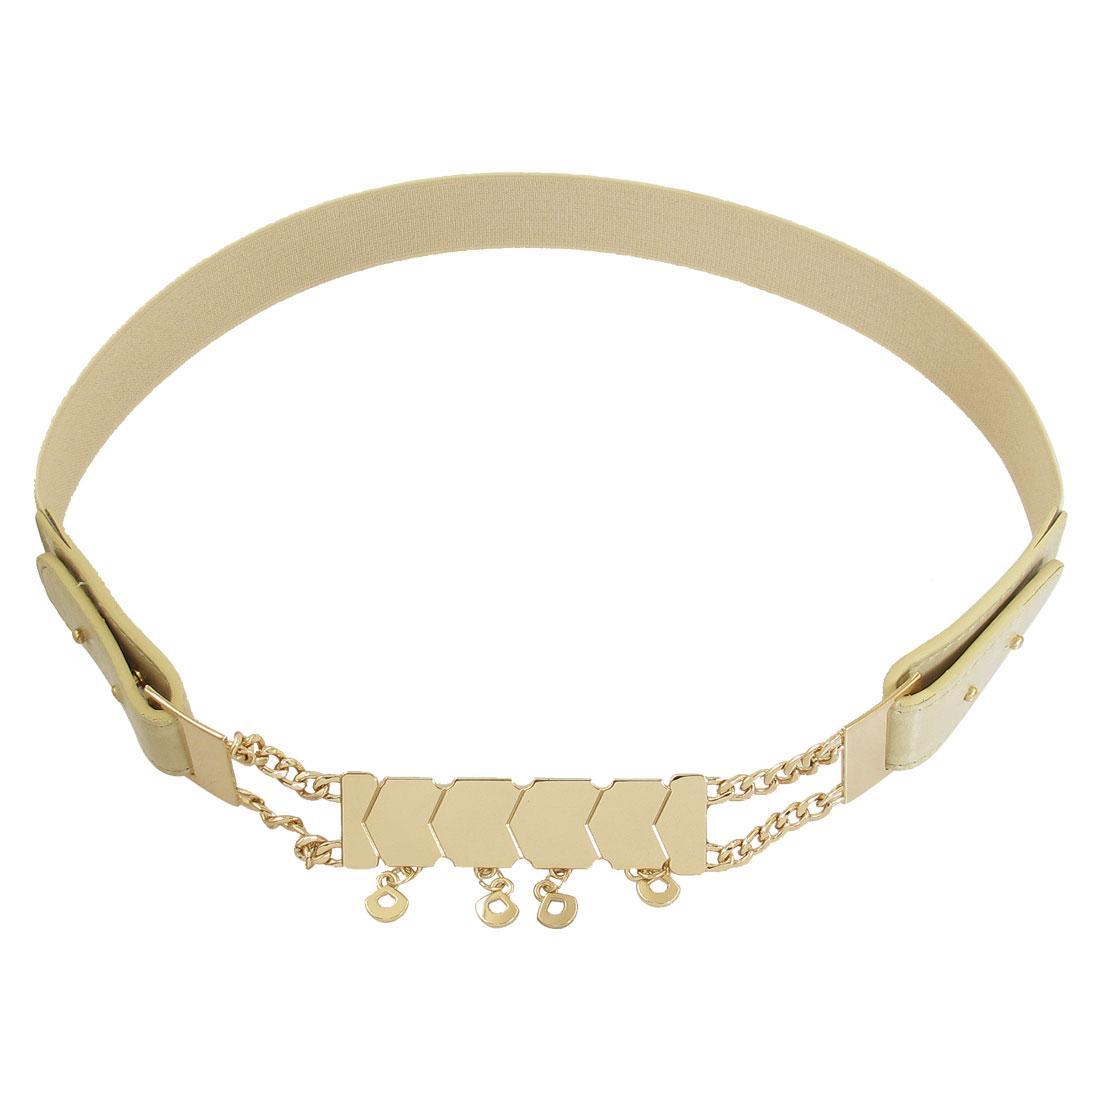 Woman Chain Decor Hook Buckle Stretchy Khaki Waist Belt Waistband Corset Band Cinch